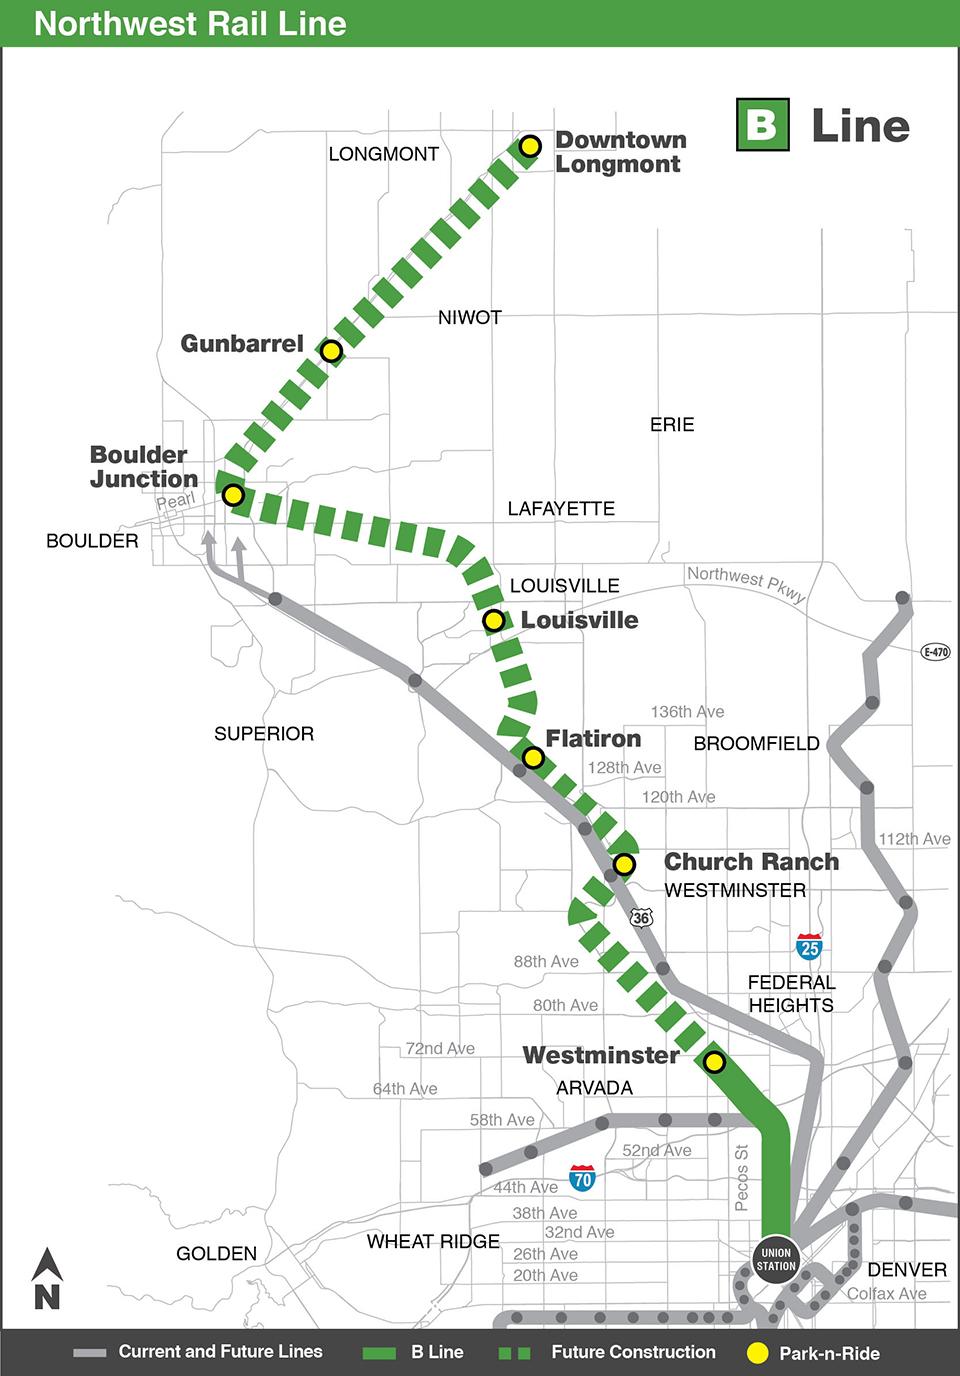 Photo: RTD B Line Northwest Corridor map